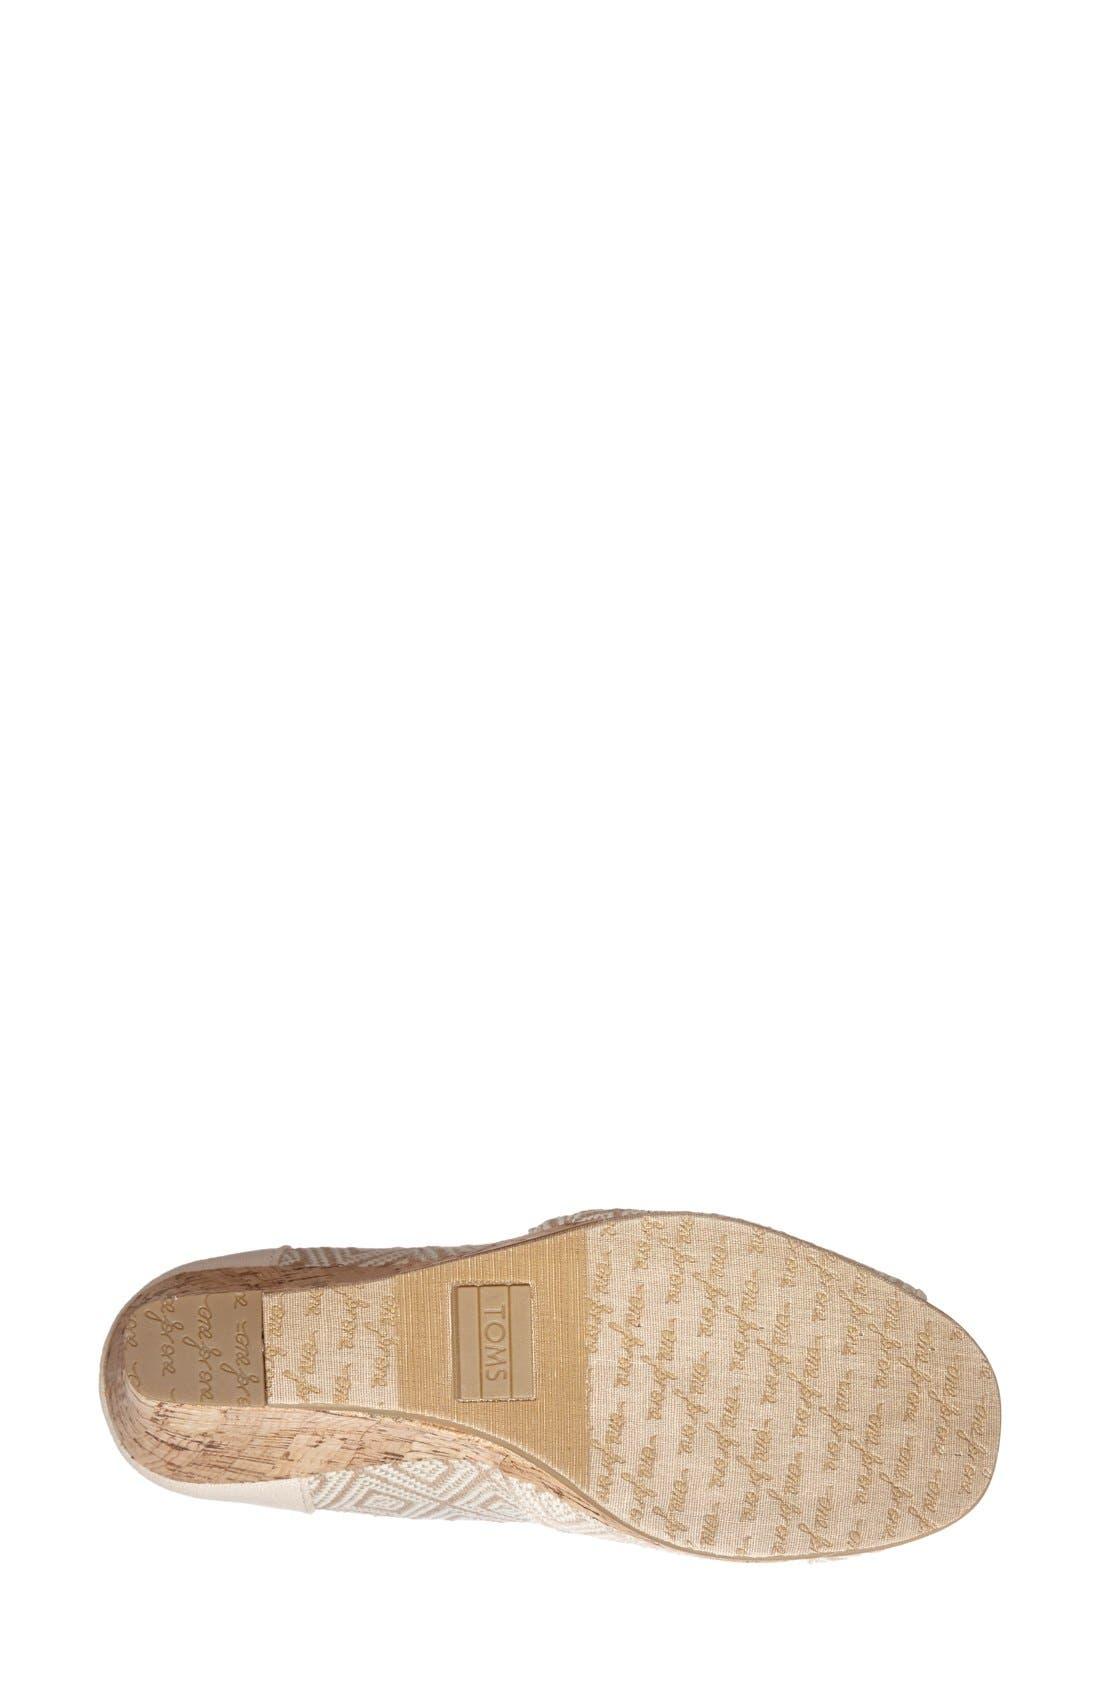 Alternate Image 4  - TOMS 'Classic' Woven Wedge Sandal (Women)